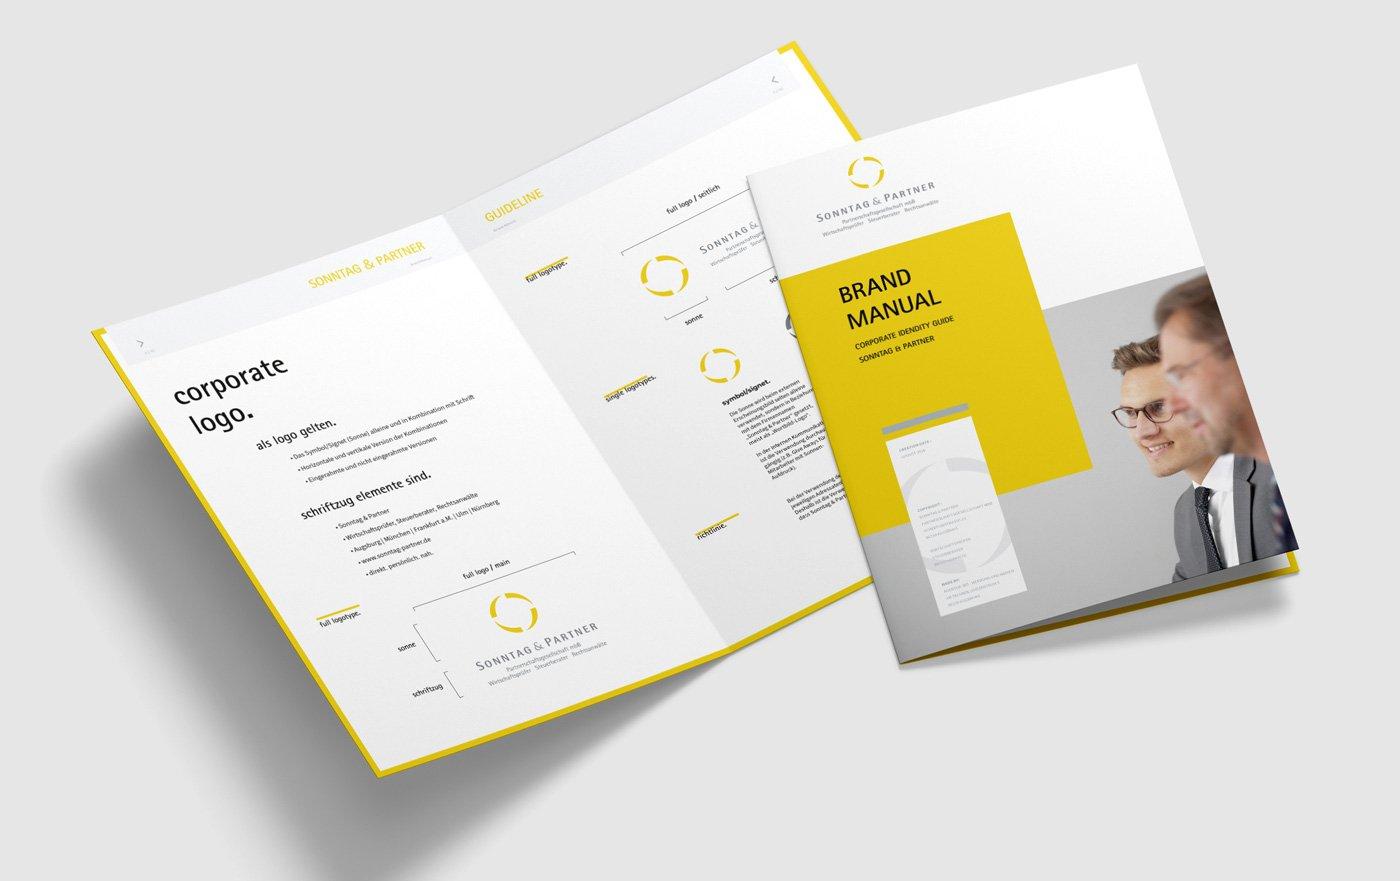 Brand, Logo und Corporate Design, Brand Manuals und Corporate Identity Guidelines 4